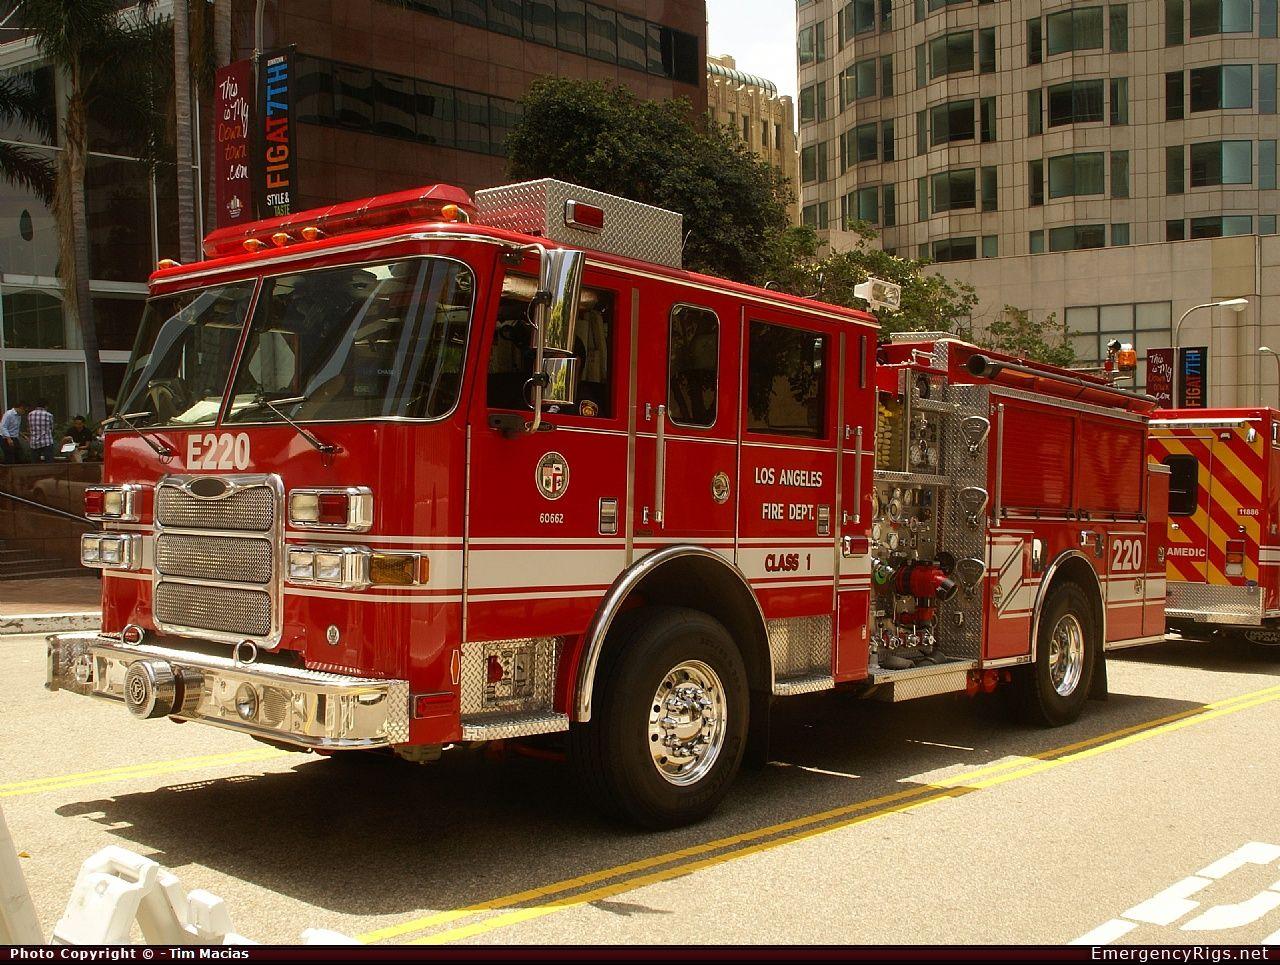 Pierce Arrow Xt Command Los Angeles Fire Department Emergency Apparatus Fire Truck Photo Fire Trucks Los Angeles Fire Department Fire Department